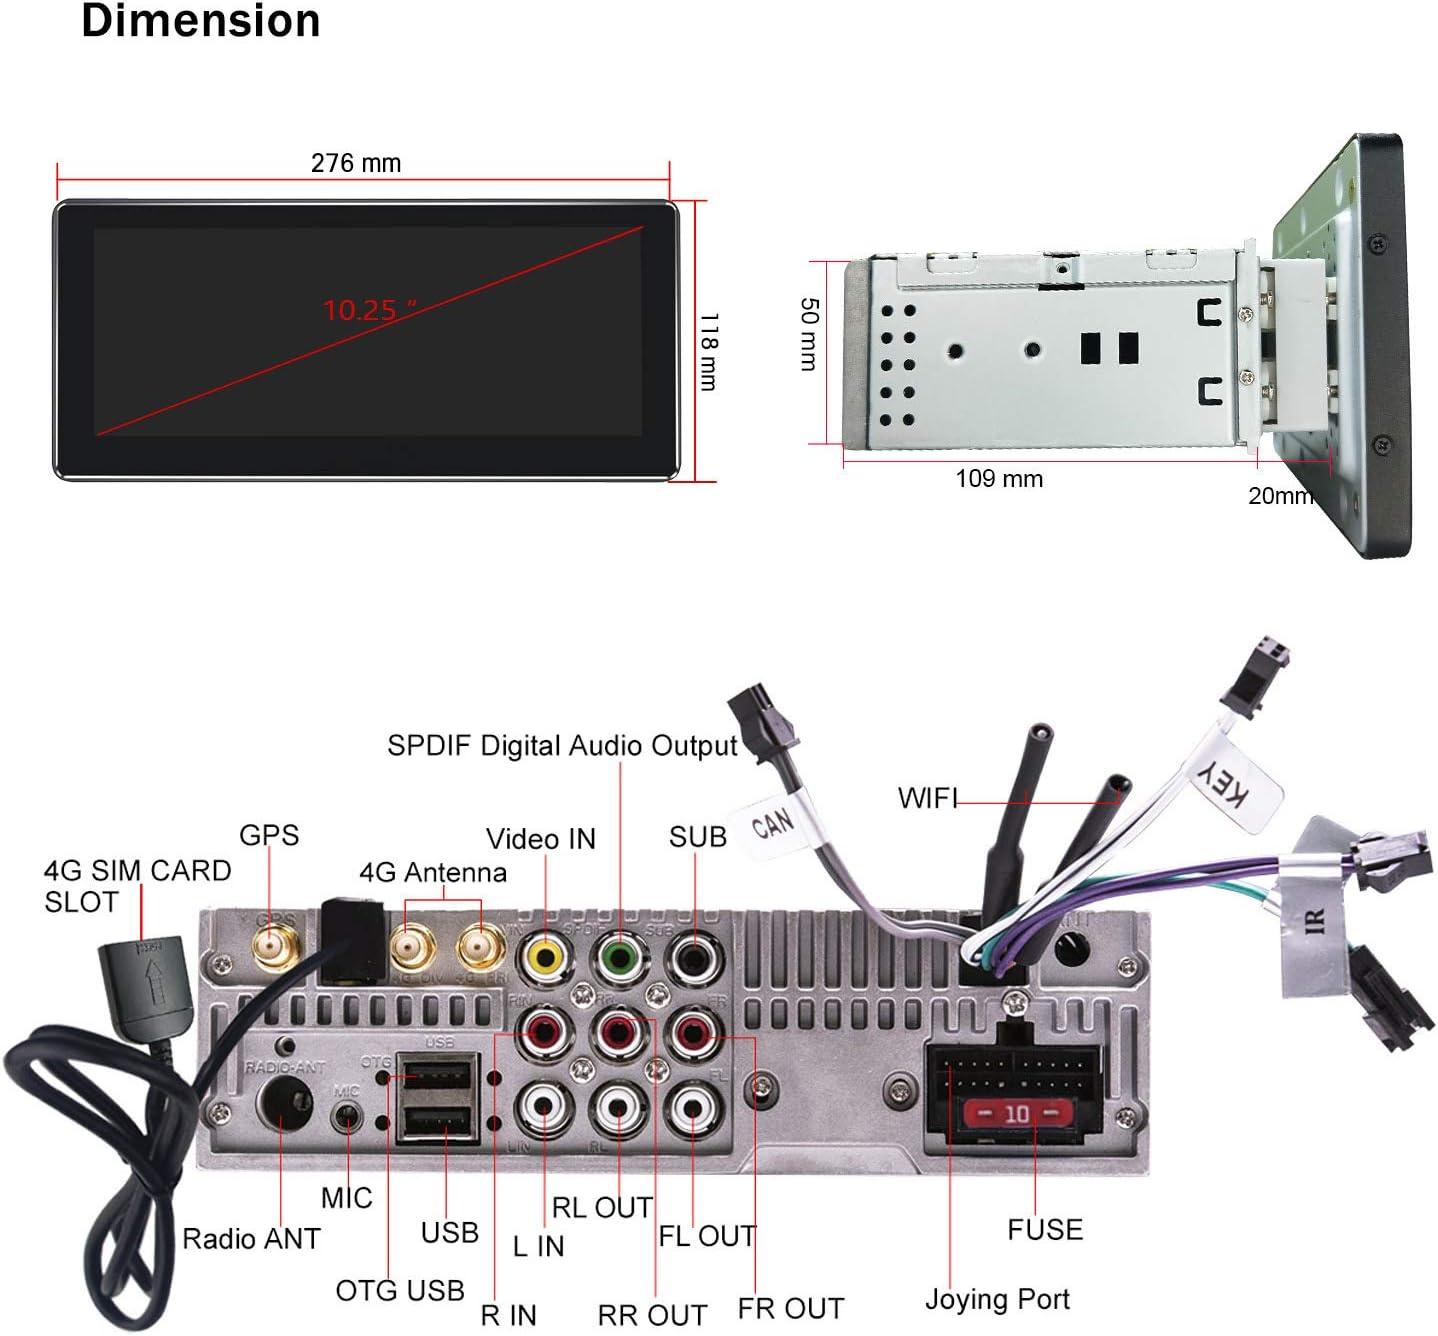 64GB Octa Core 10.25 inch Single Din In-dash Head Unit with Zlink ...